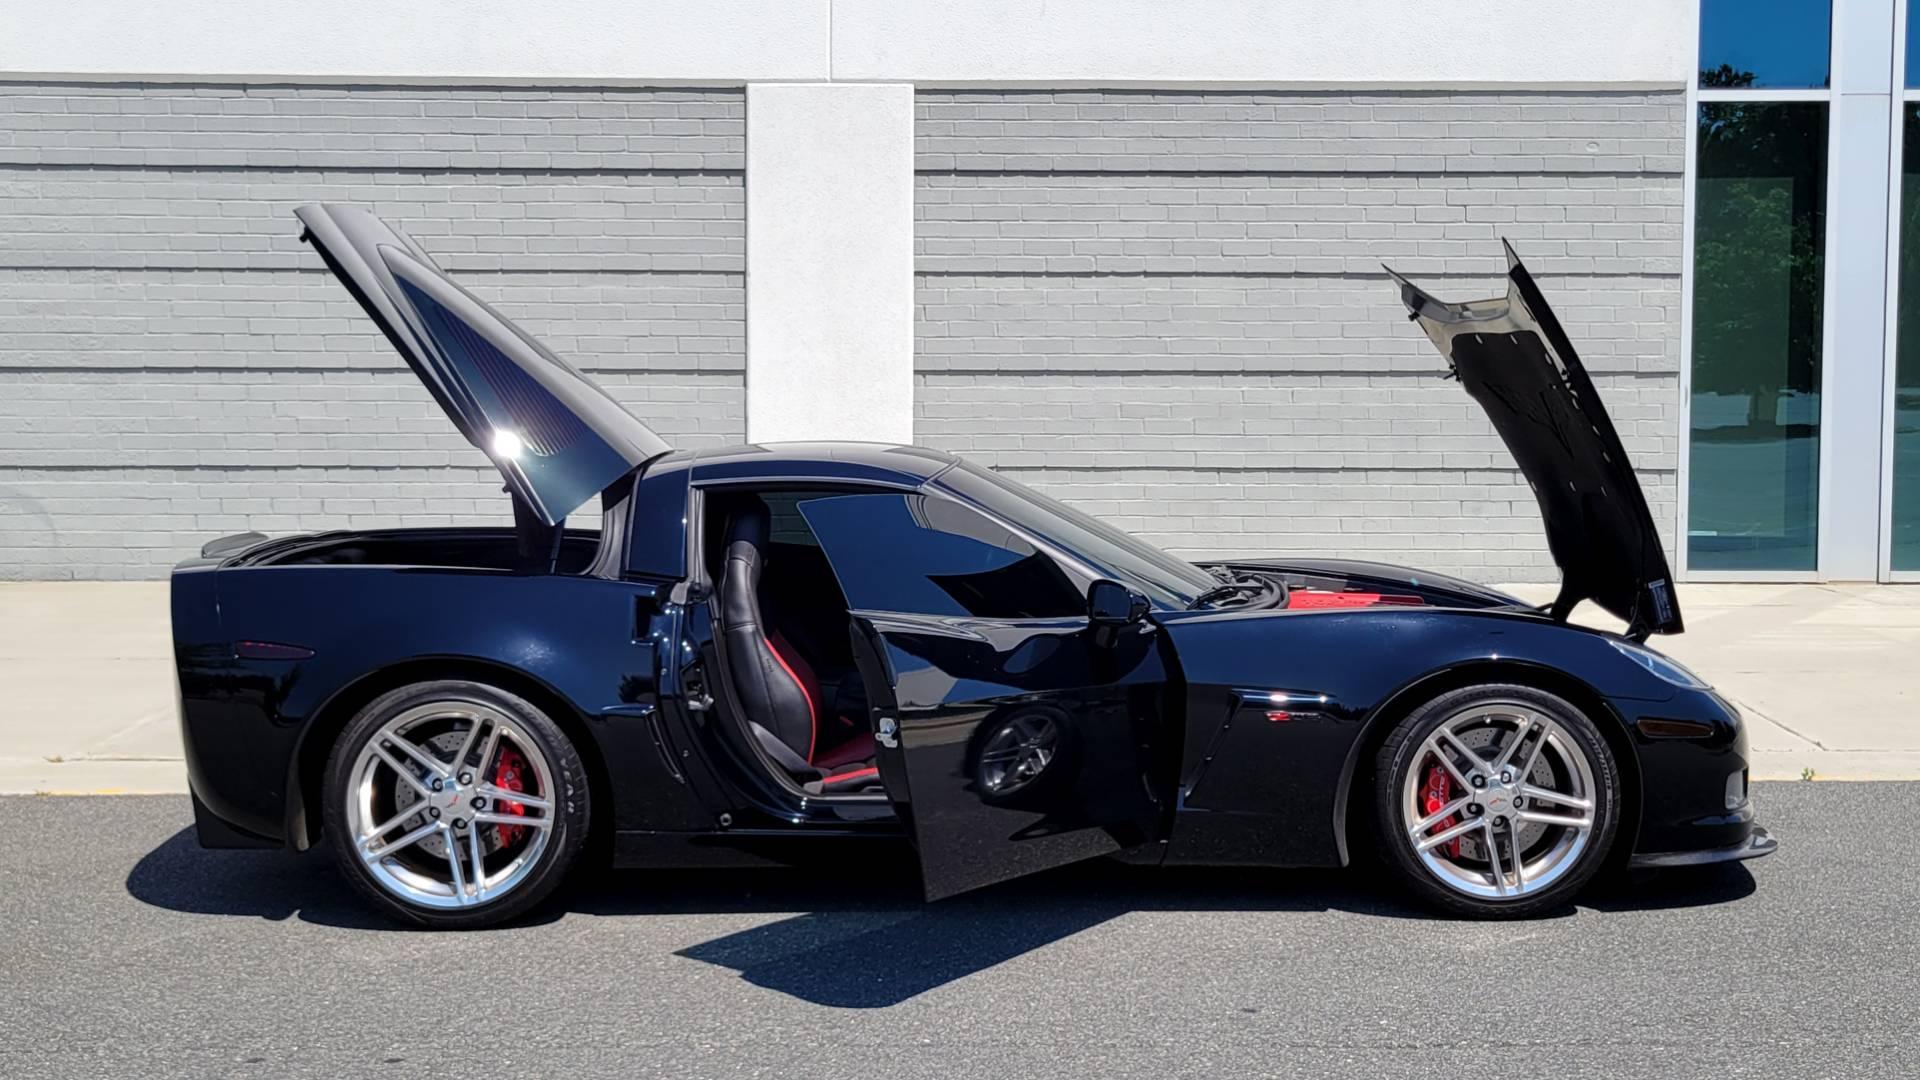 Used 2007 Chevrolet CORVETTE Z06 2LZ / 7.0L 427 V8 / 6-SPD MAN / BOSE / POLISHED WHEELS for sale Sold at Formula Imports in Charlotte NC 28227 9